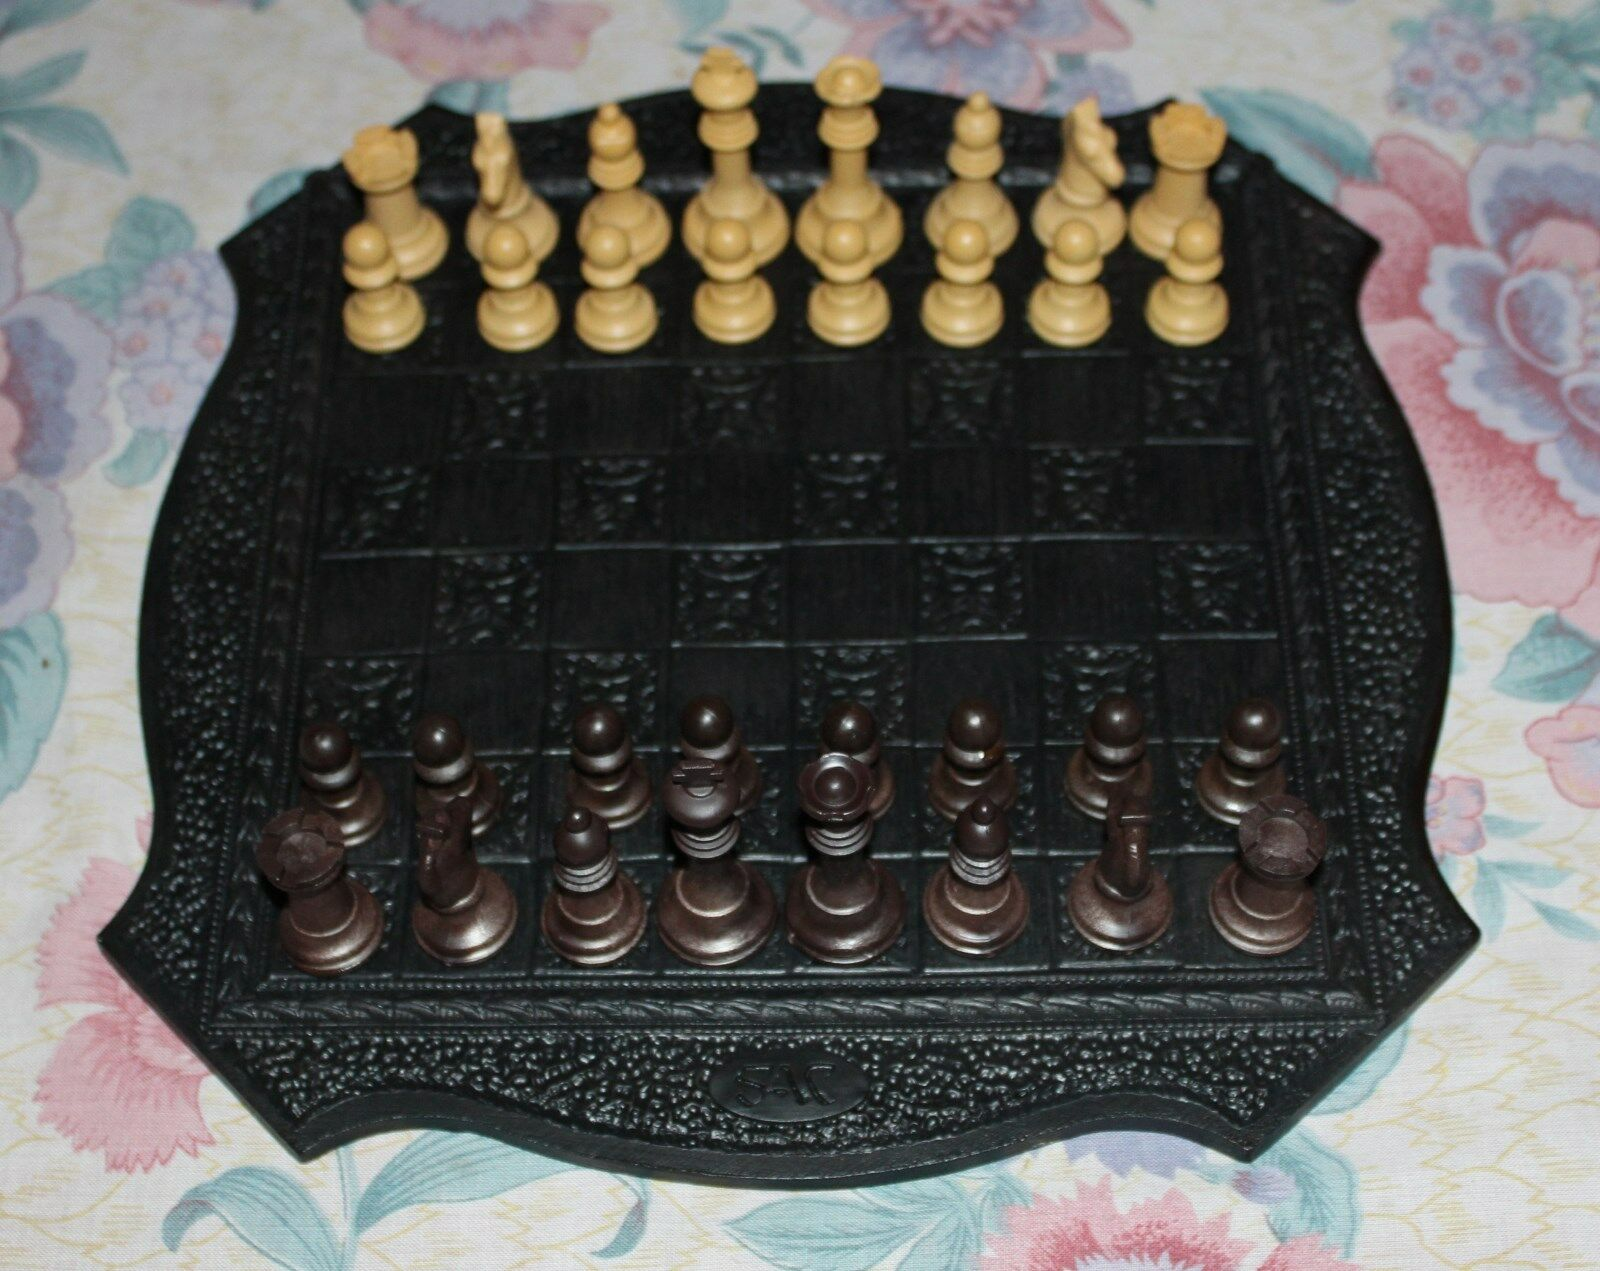 Studio Anne Carlton  Staunton Chess Set with Ornate Resin Board